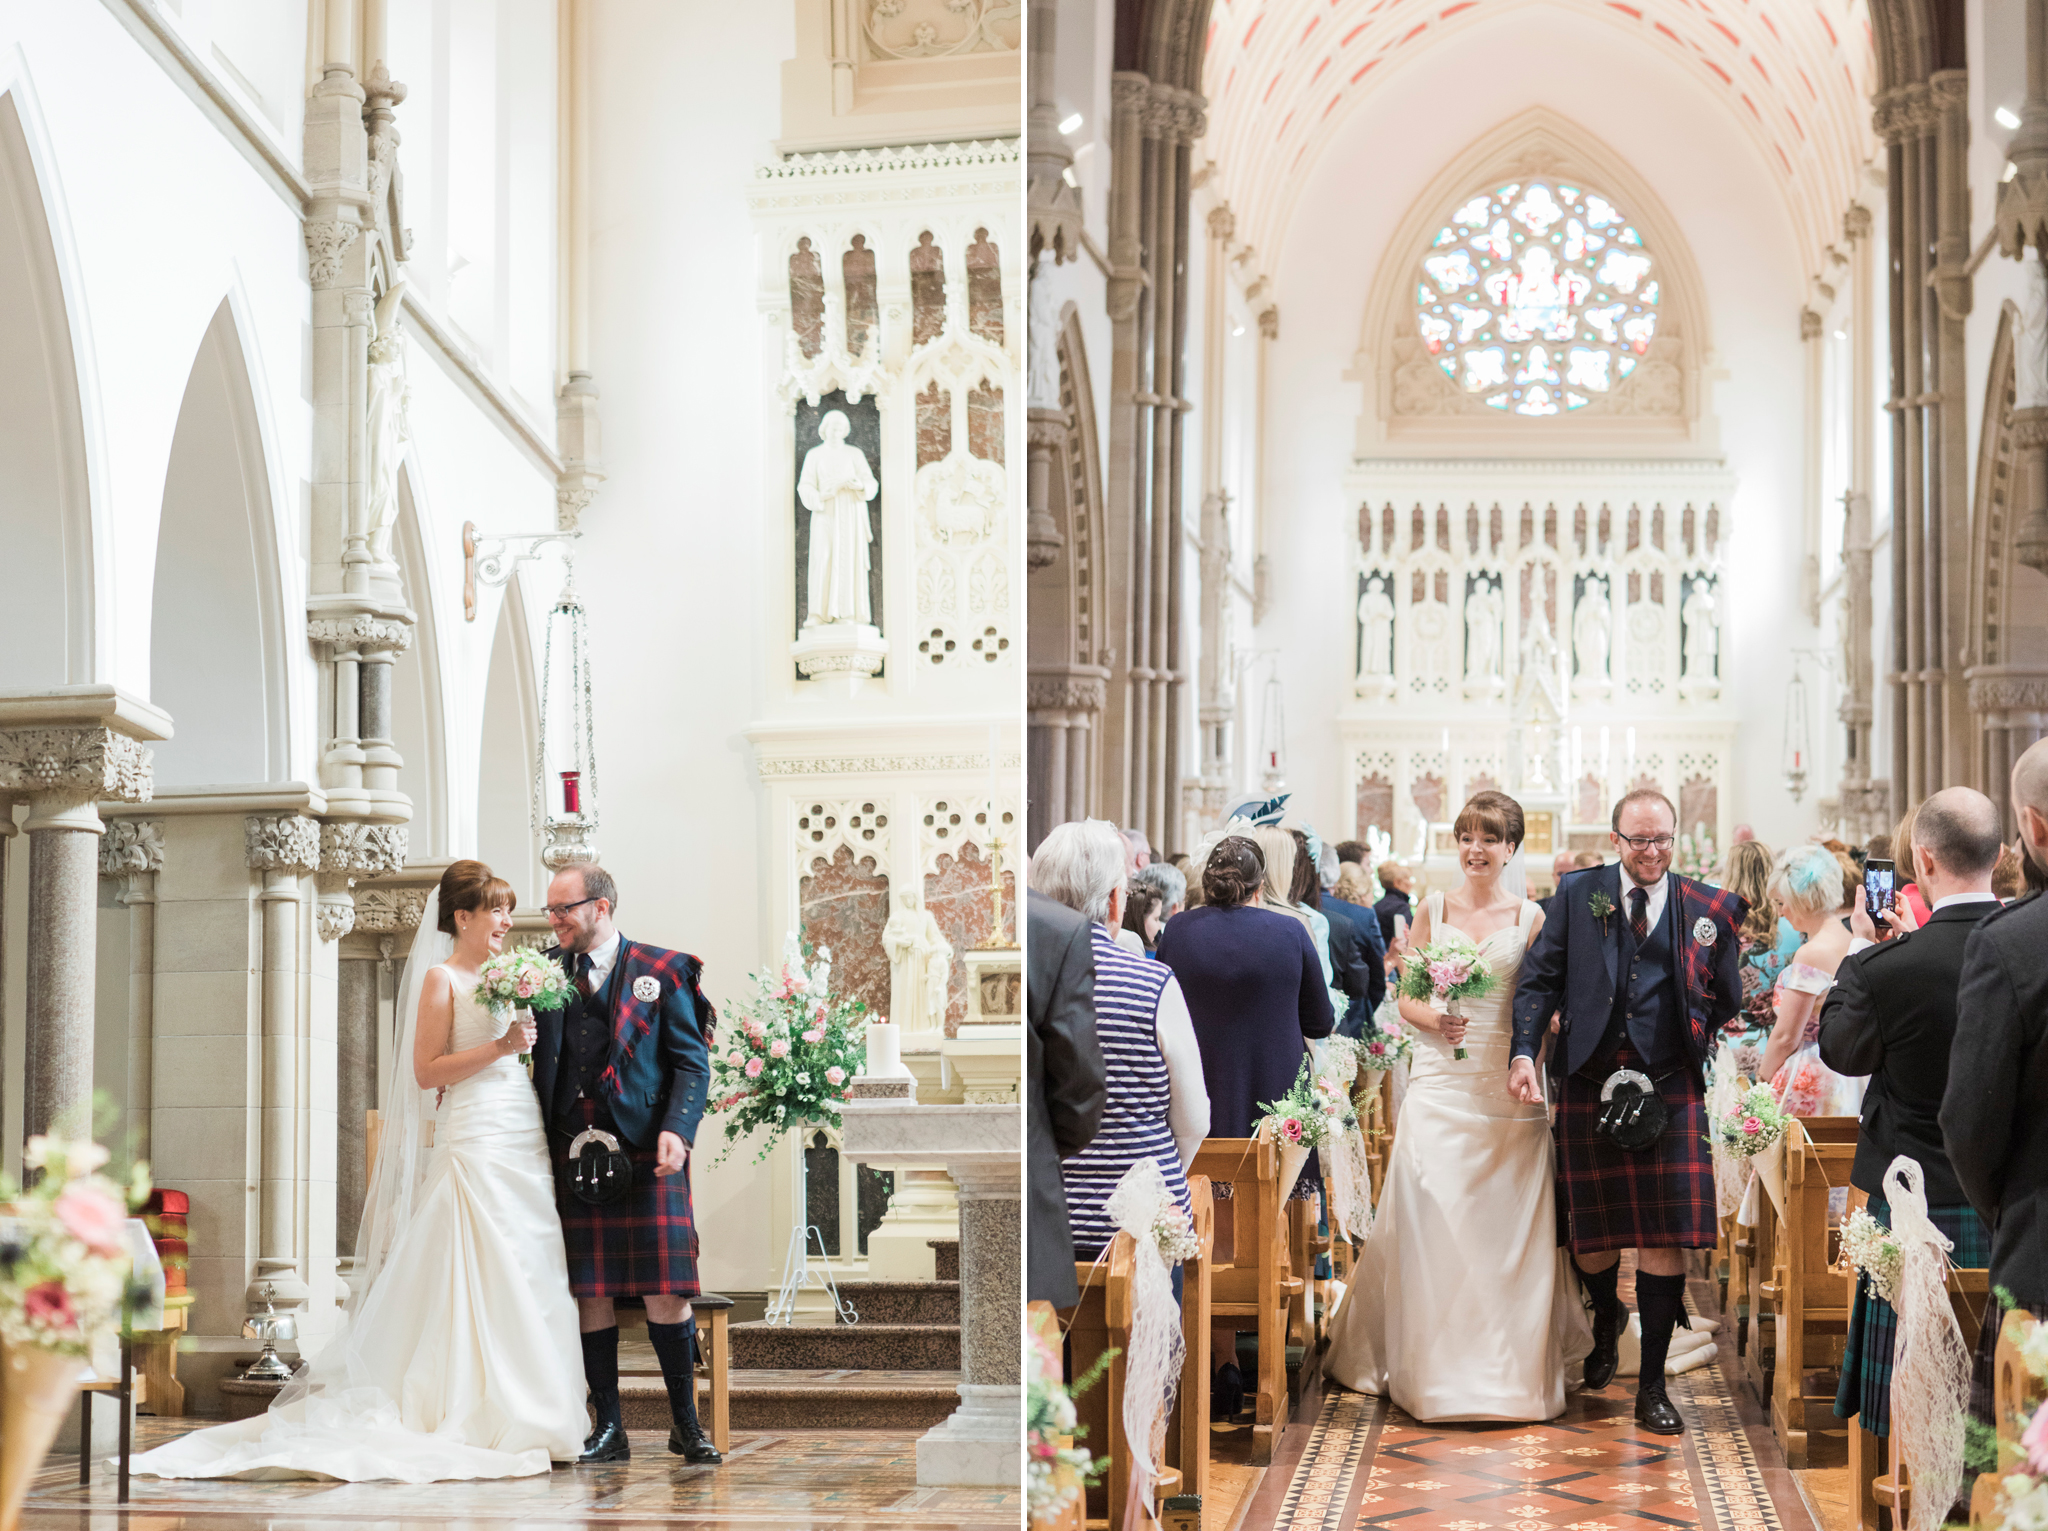 058-natural-wedding-photography.jpg